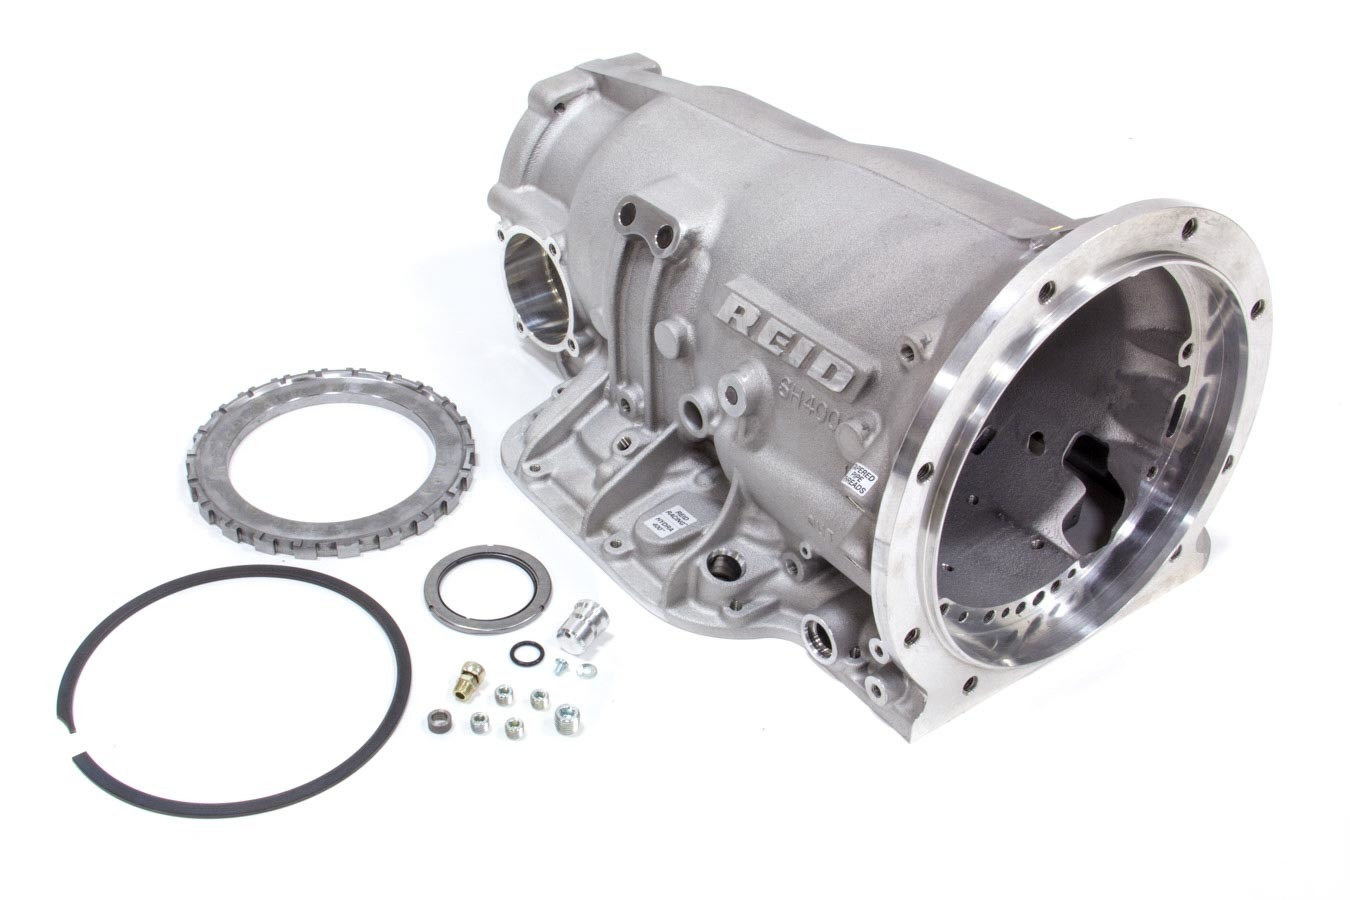 Reid Racing SH400-DRAG Transmission Case, Drag / Street, Super Hydra 400, SFI 4.1, 2 Piece, Aluminum, Natural, GM TH400, Each